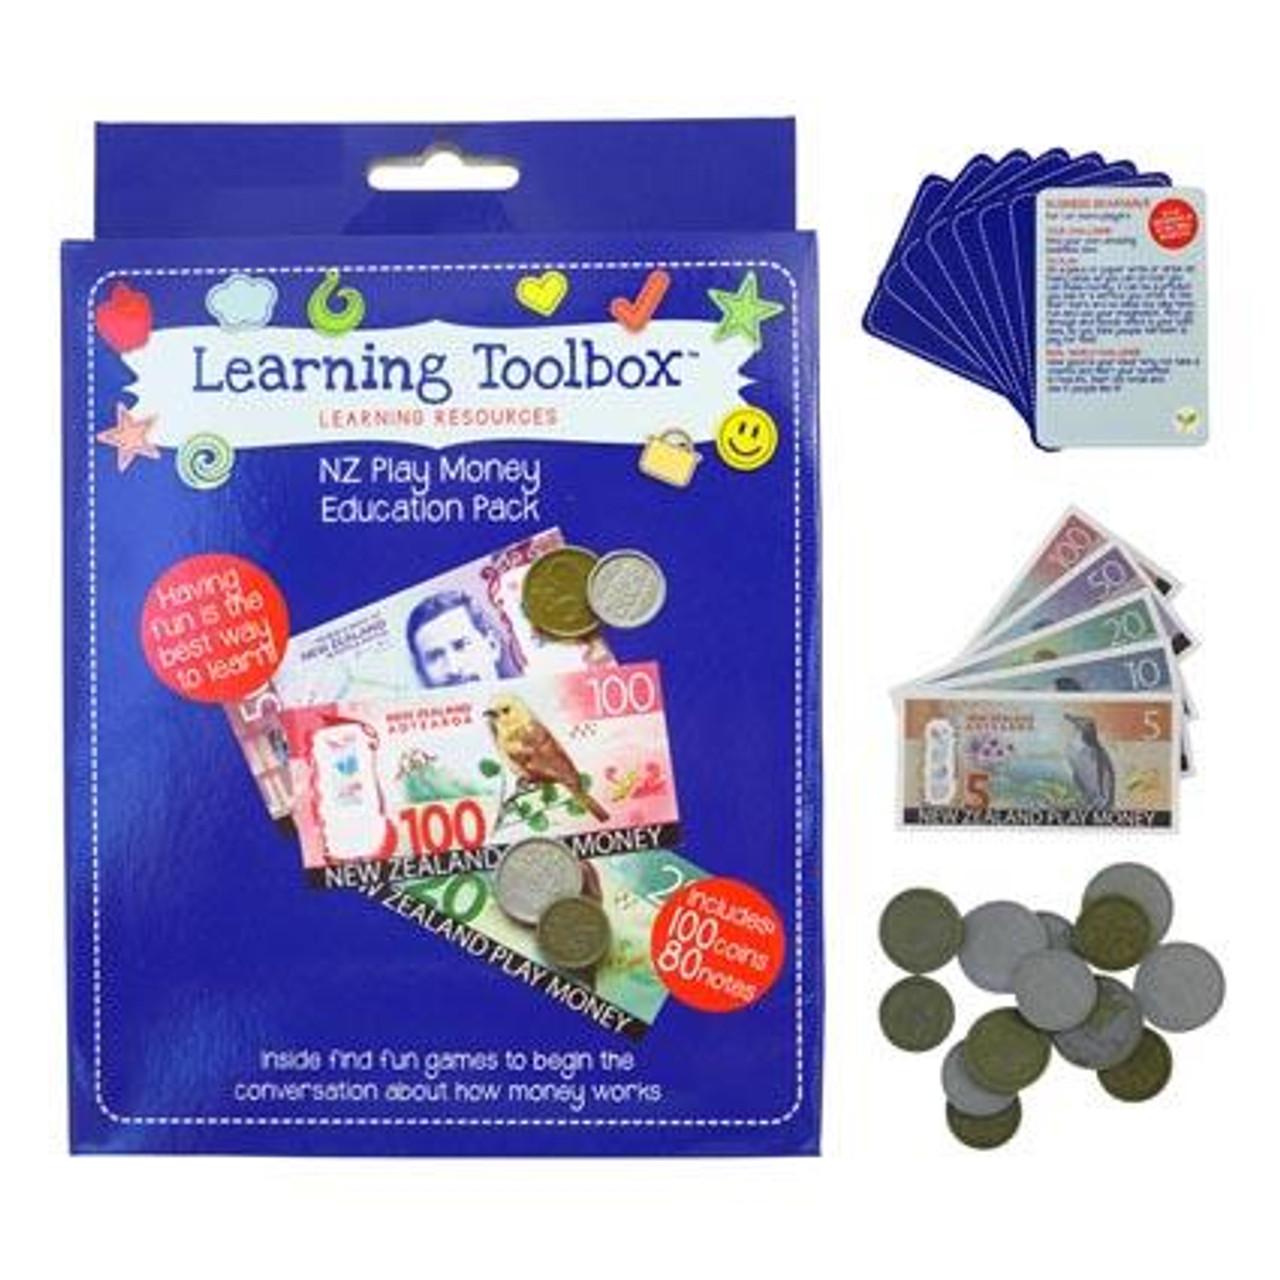 New Zealand Play Money pack